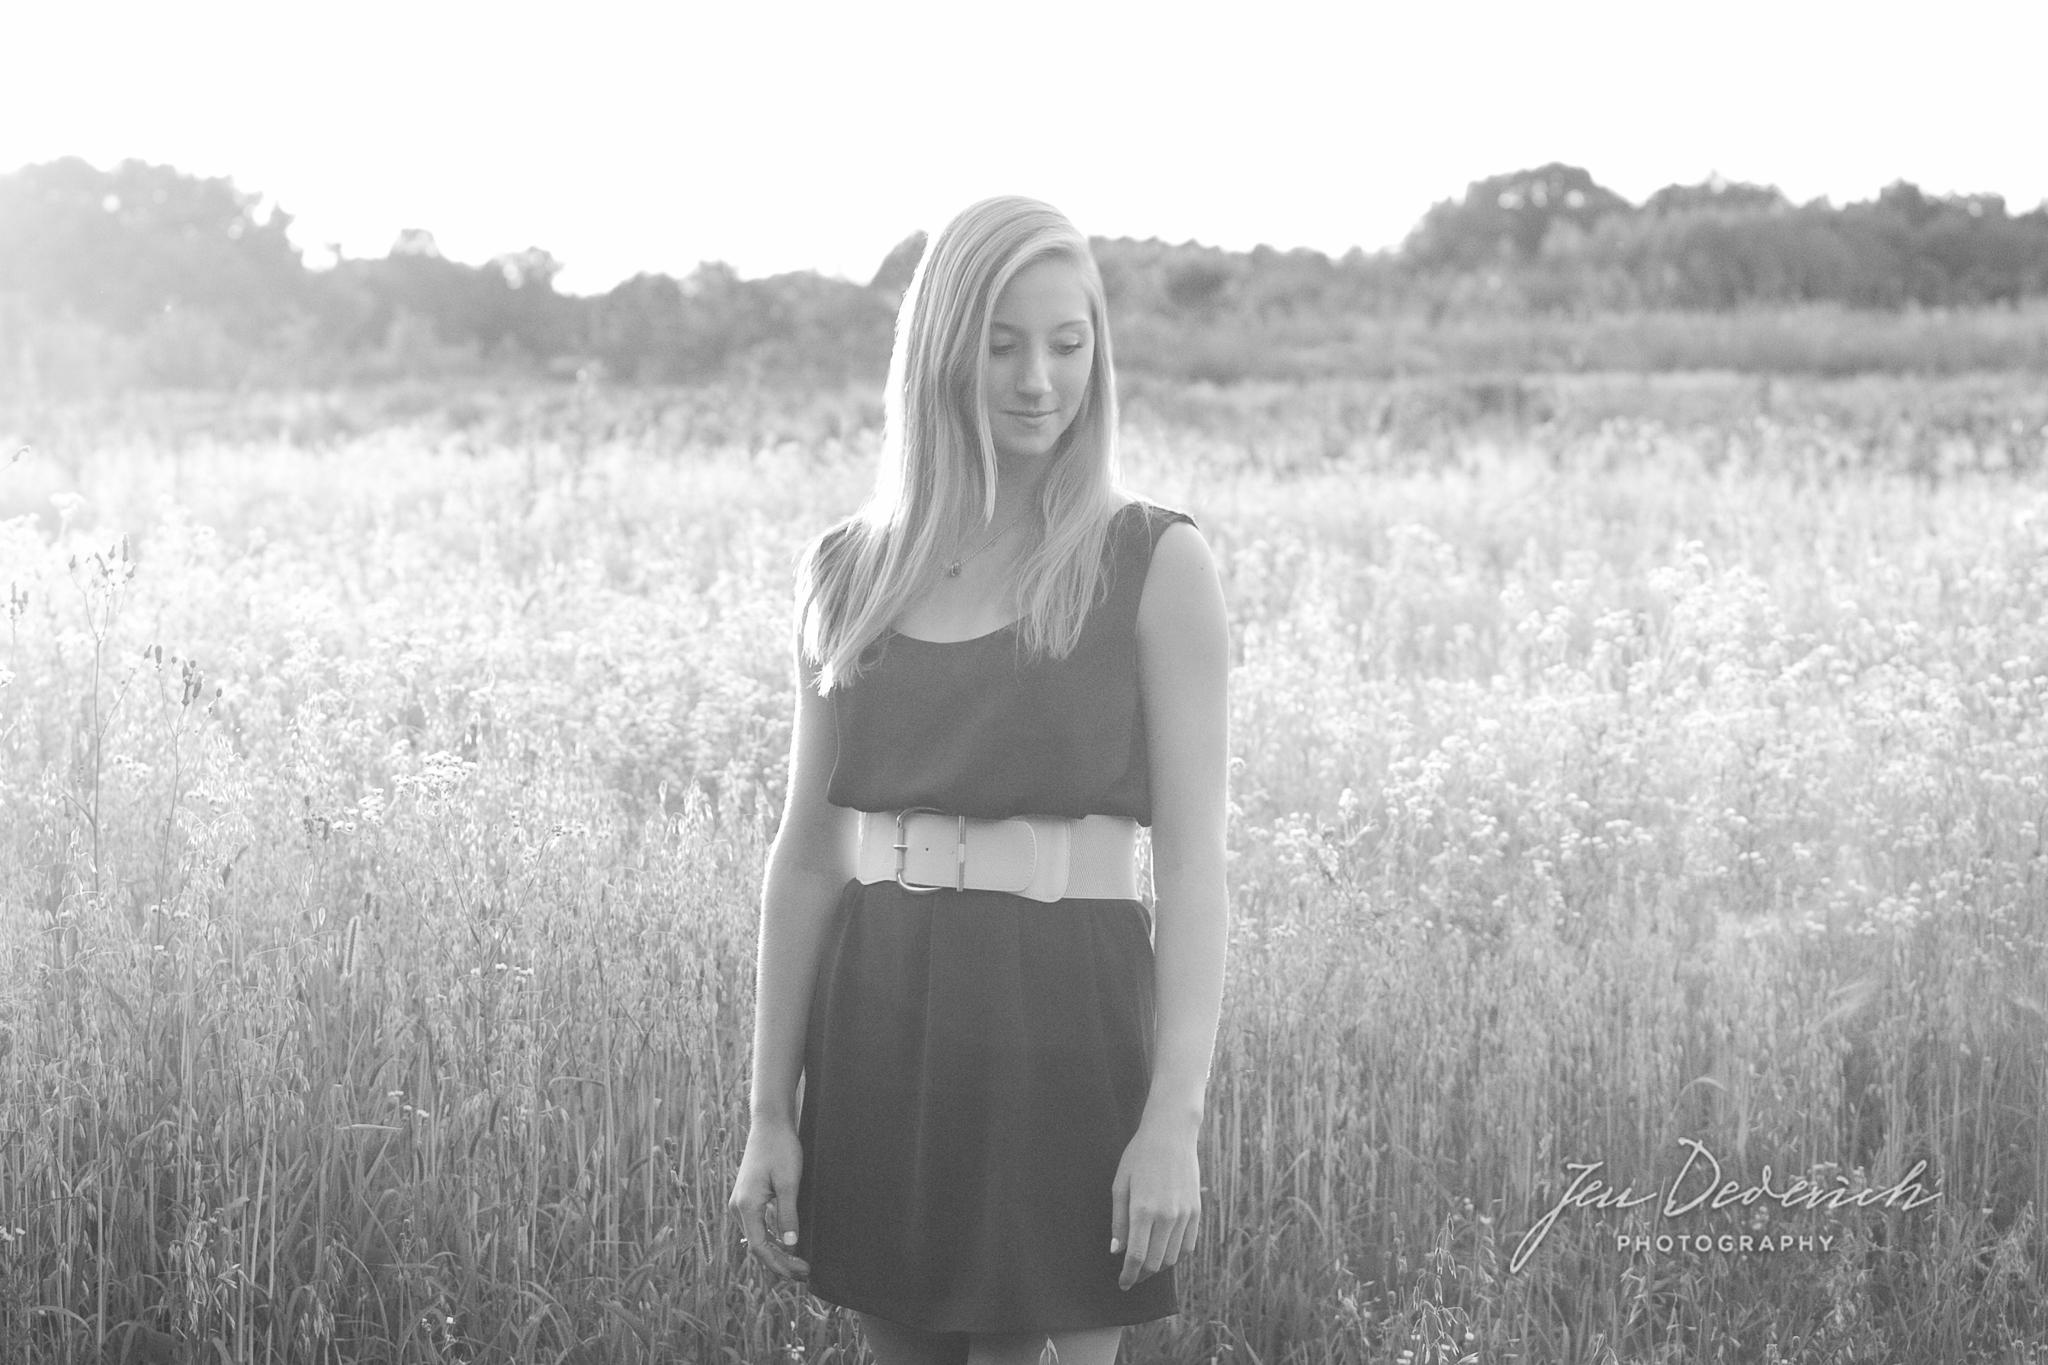 Senior_Madison WI_Jen Dederich Photography_009.jpg